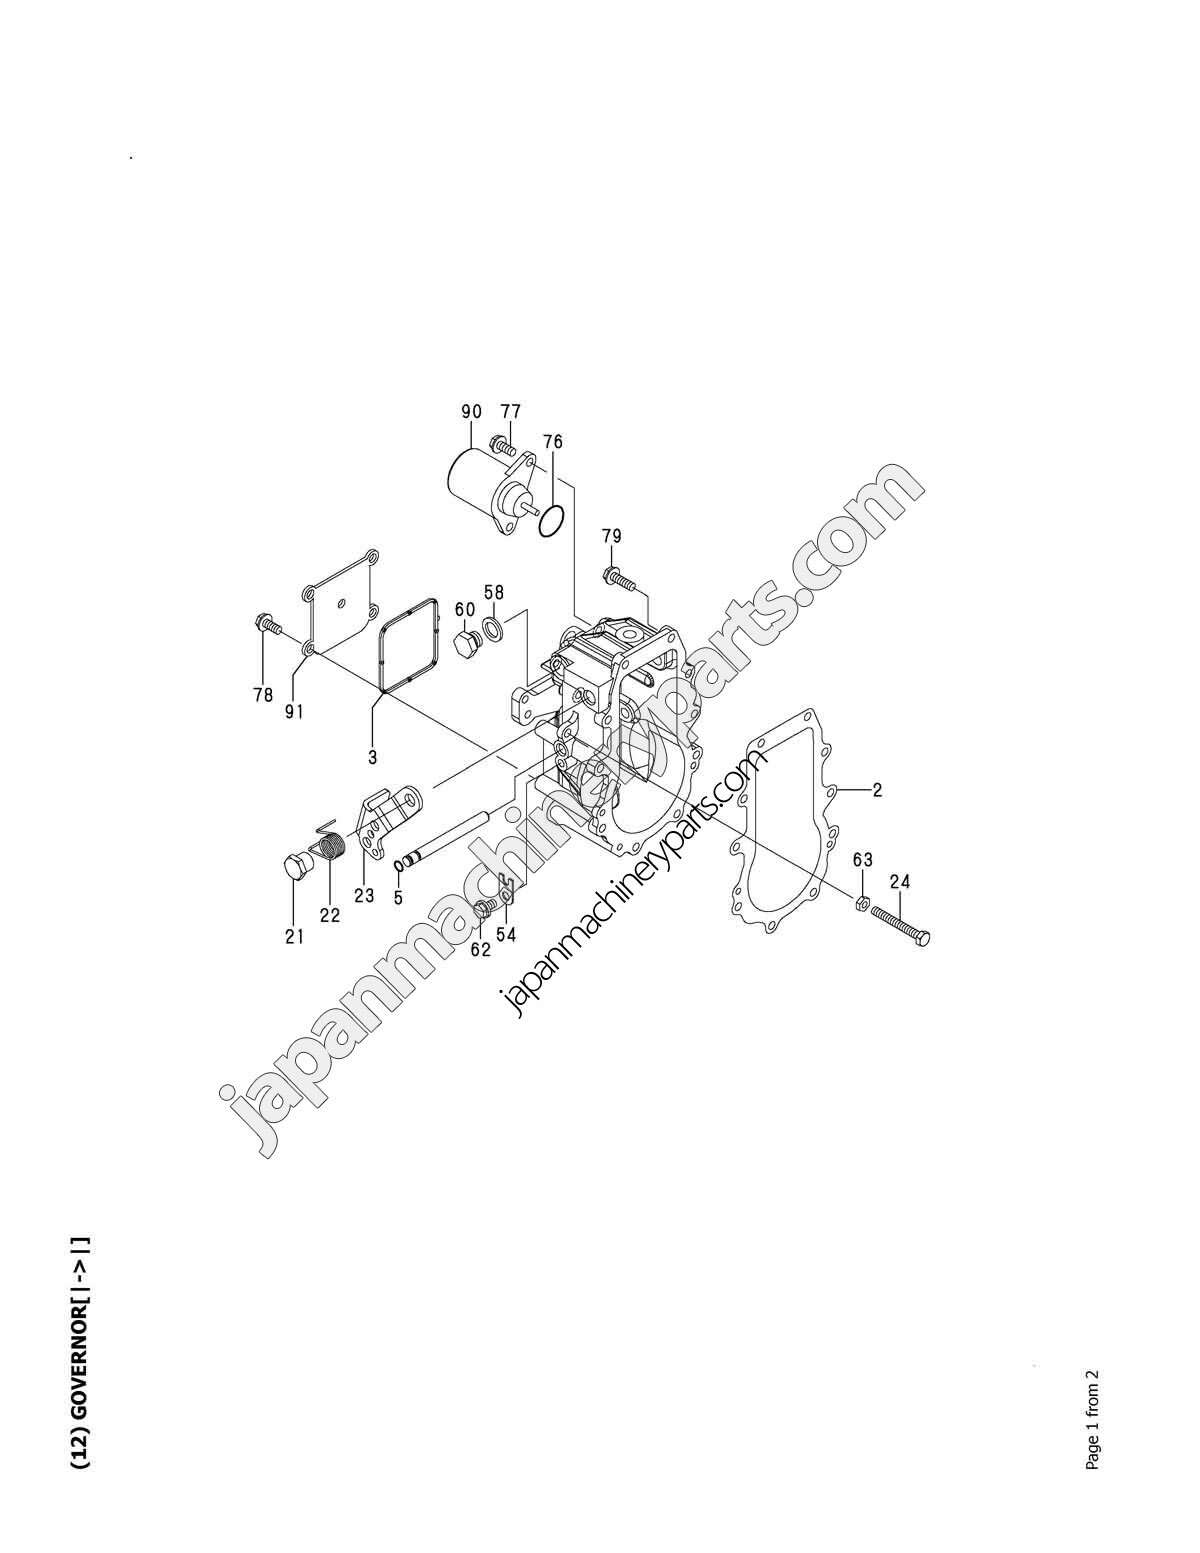 Polaris Wiring Harness Repair Kit Schematics Diagrams Ficm Diagram Yanmar 4tnv Engine Wire